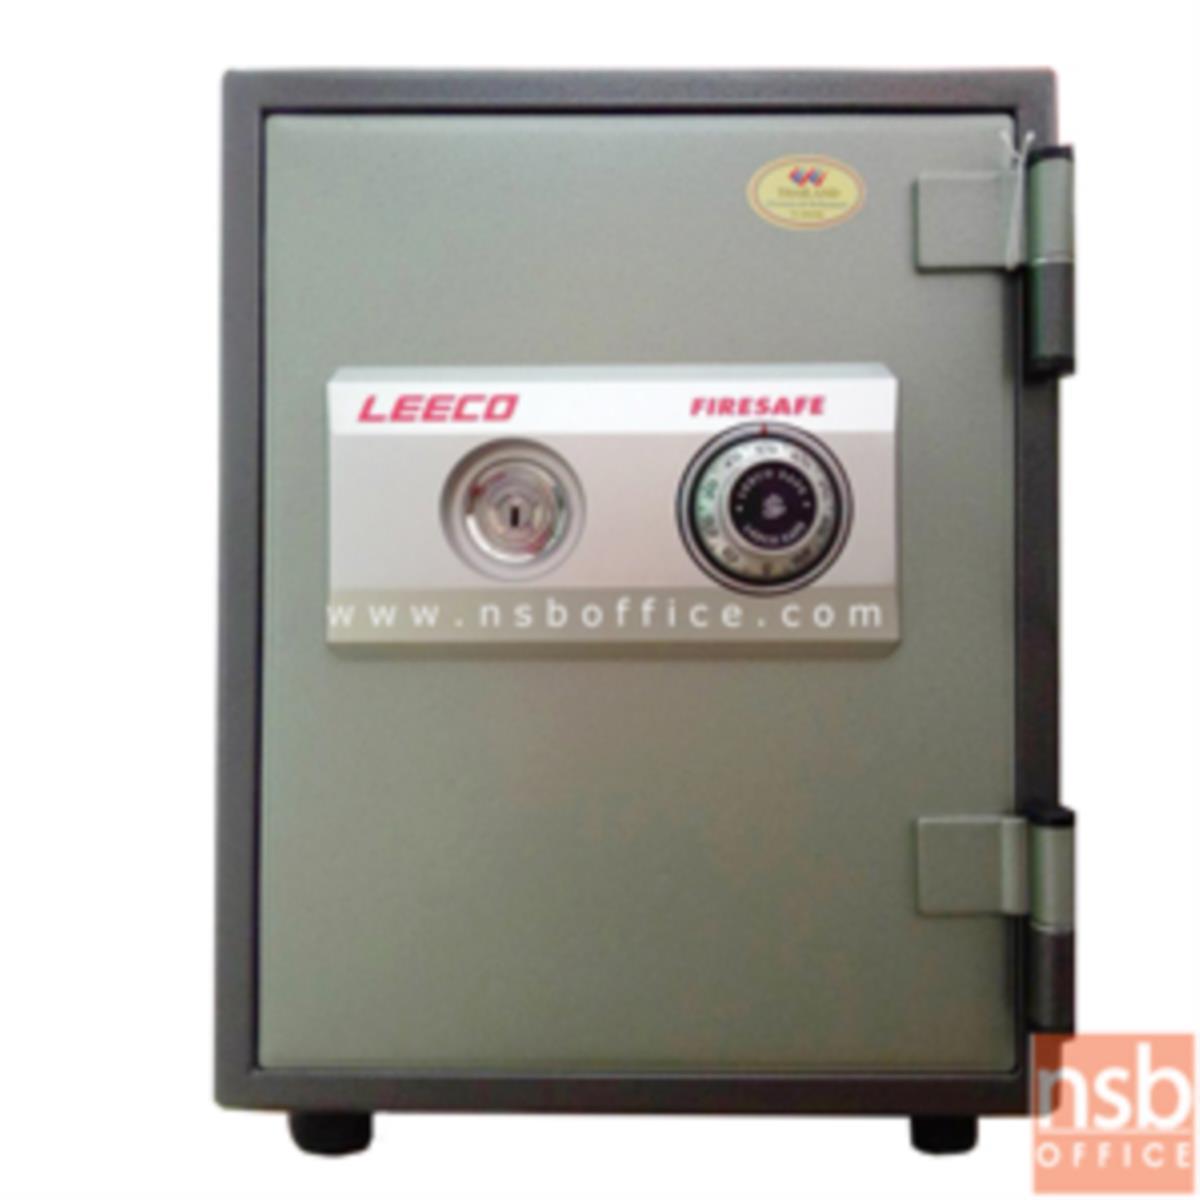 F02A005:ตู้เซฟนิรภัย 25 กก. ลีโก้ รุ่น LEECO-ES-7 มี 1 กุญแจ 1 รหัส (เปลี่ยนรหัสไม่ได้)